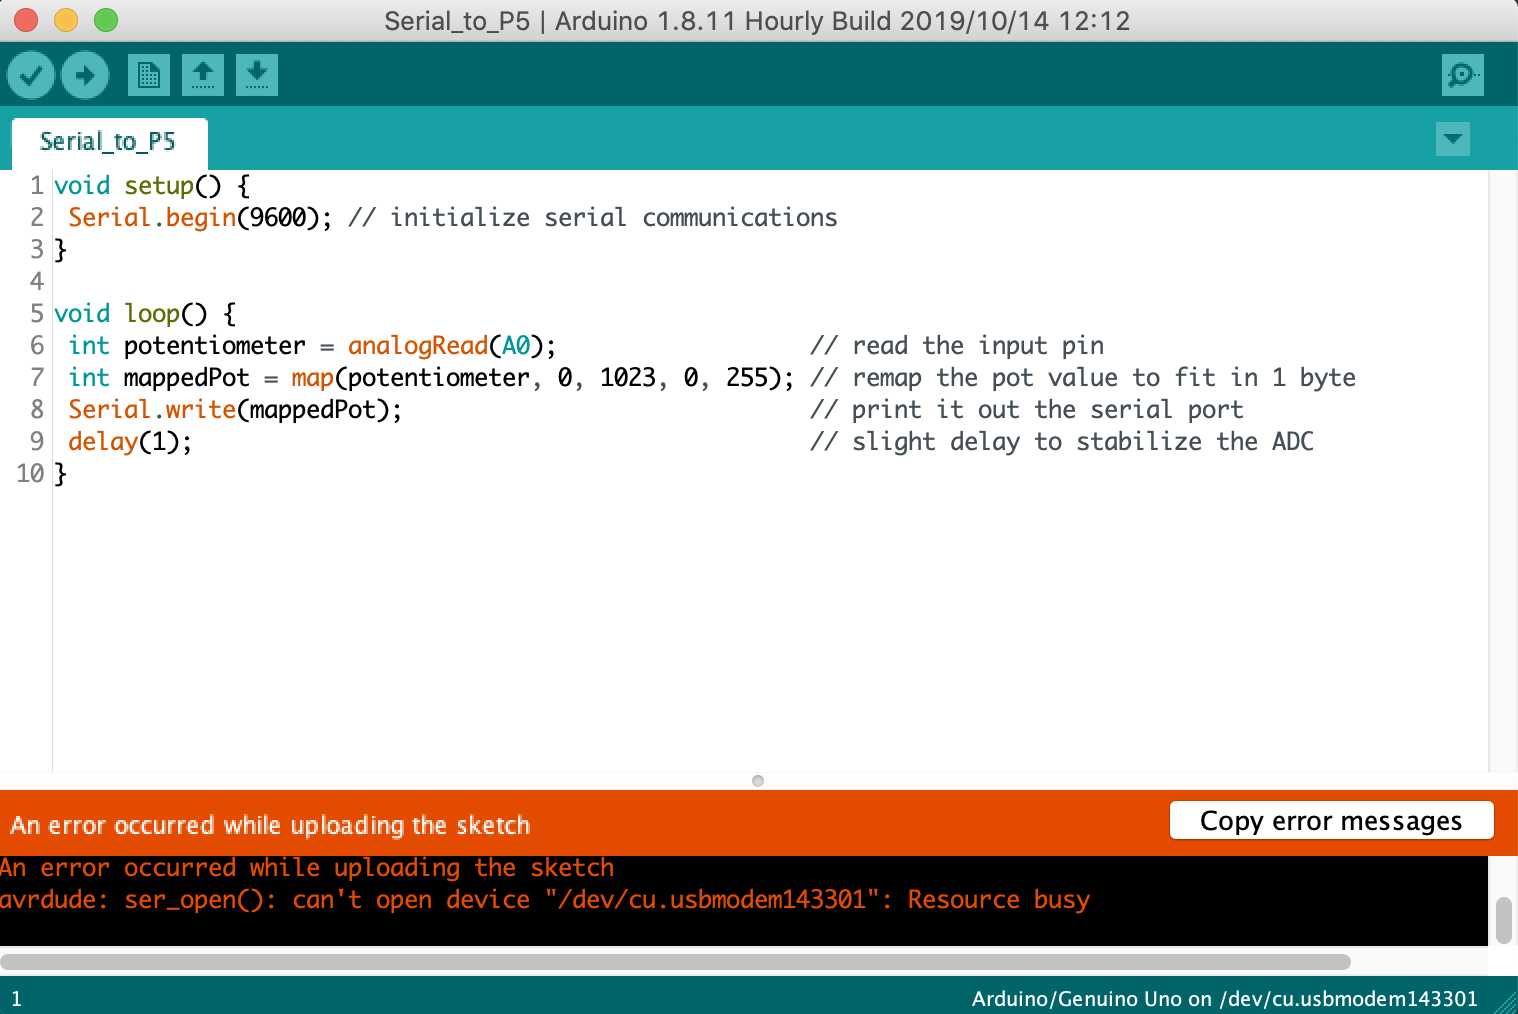 Arduino Error 2: